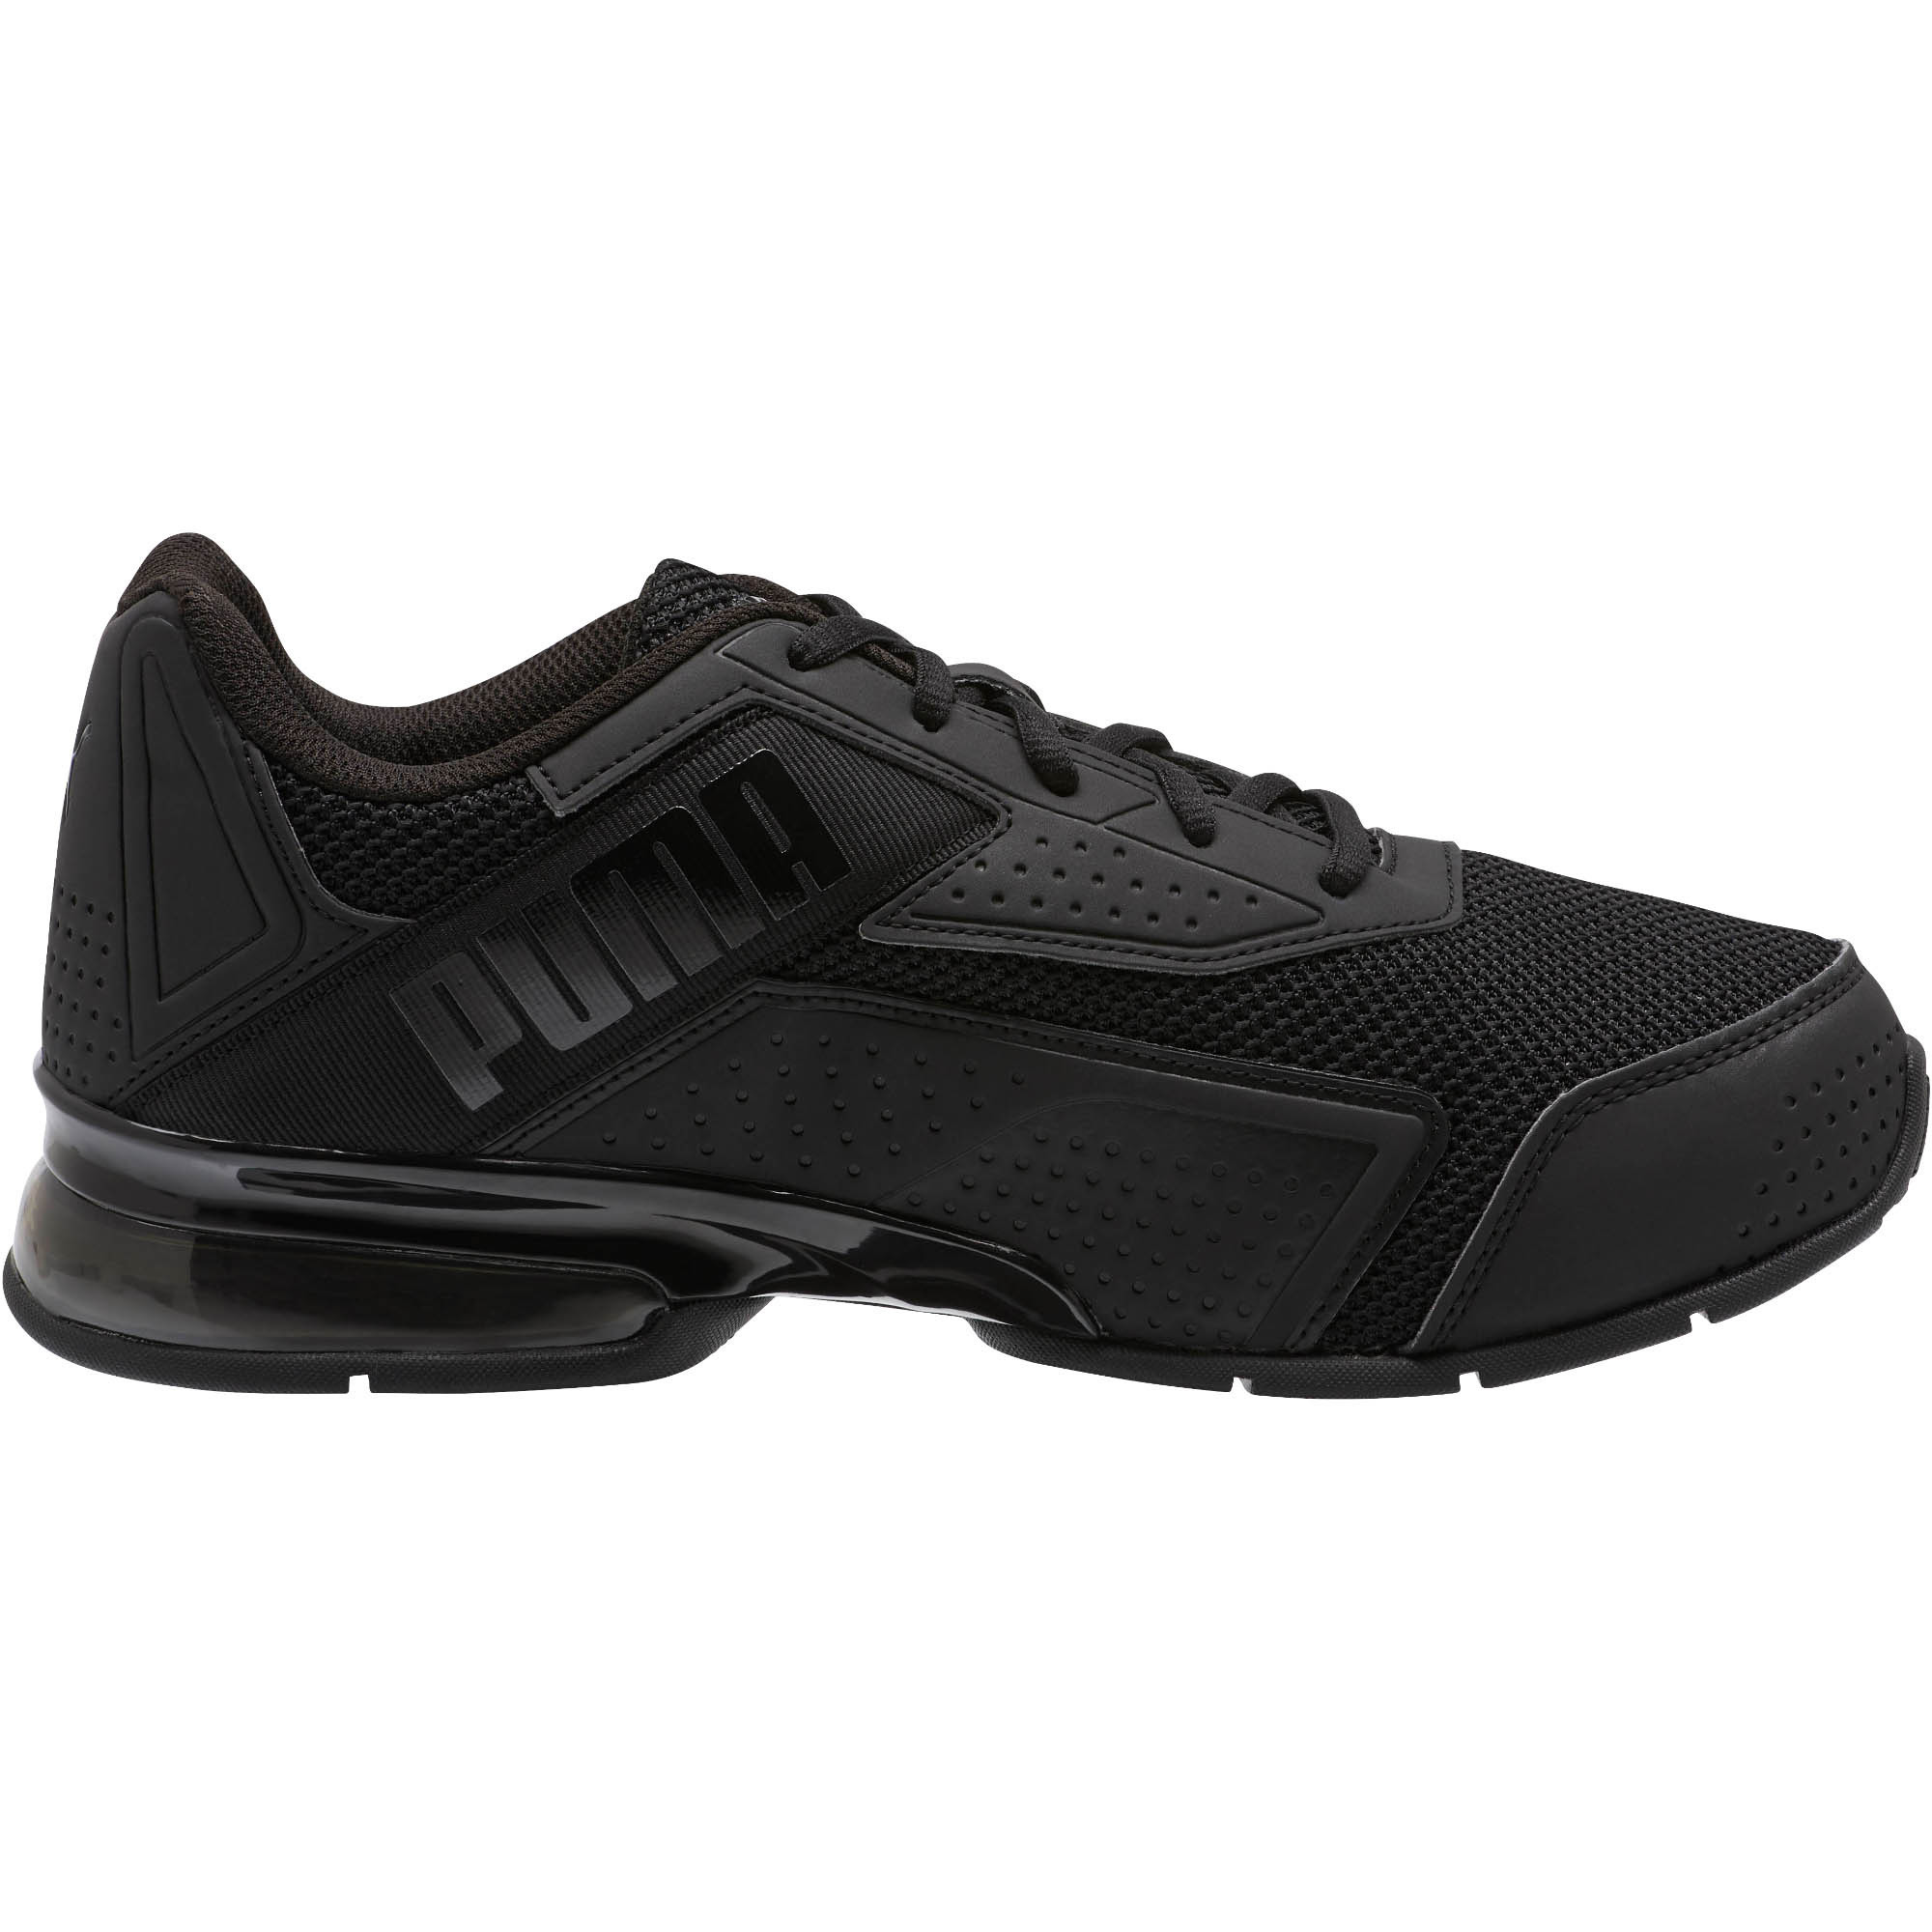 PUMA-Leader-VT-Bold-Men-039-s-Training-Shoes-Men-Shoe-Running thumbnail 10